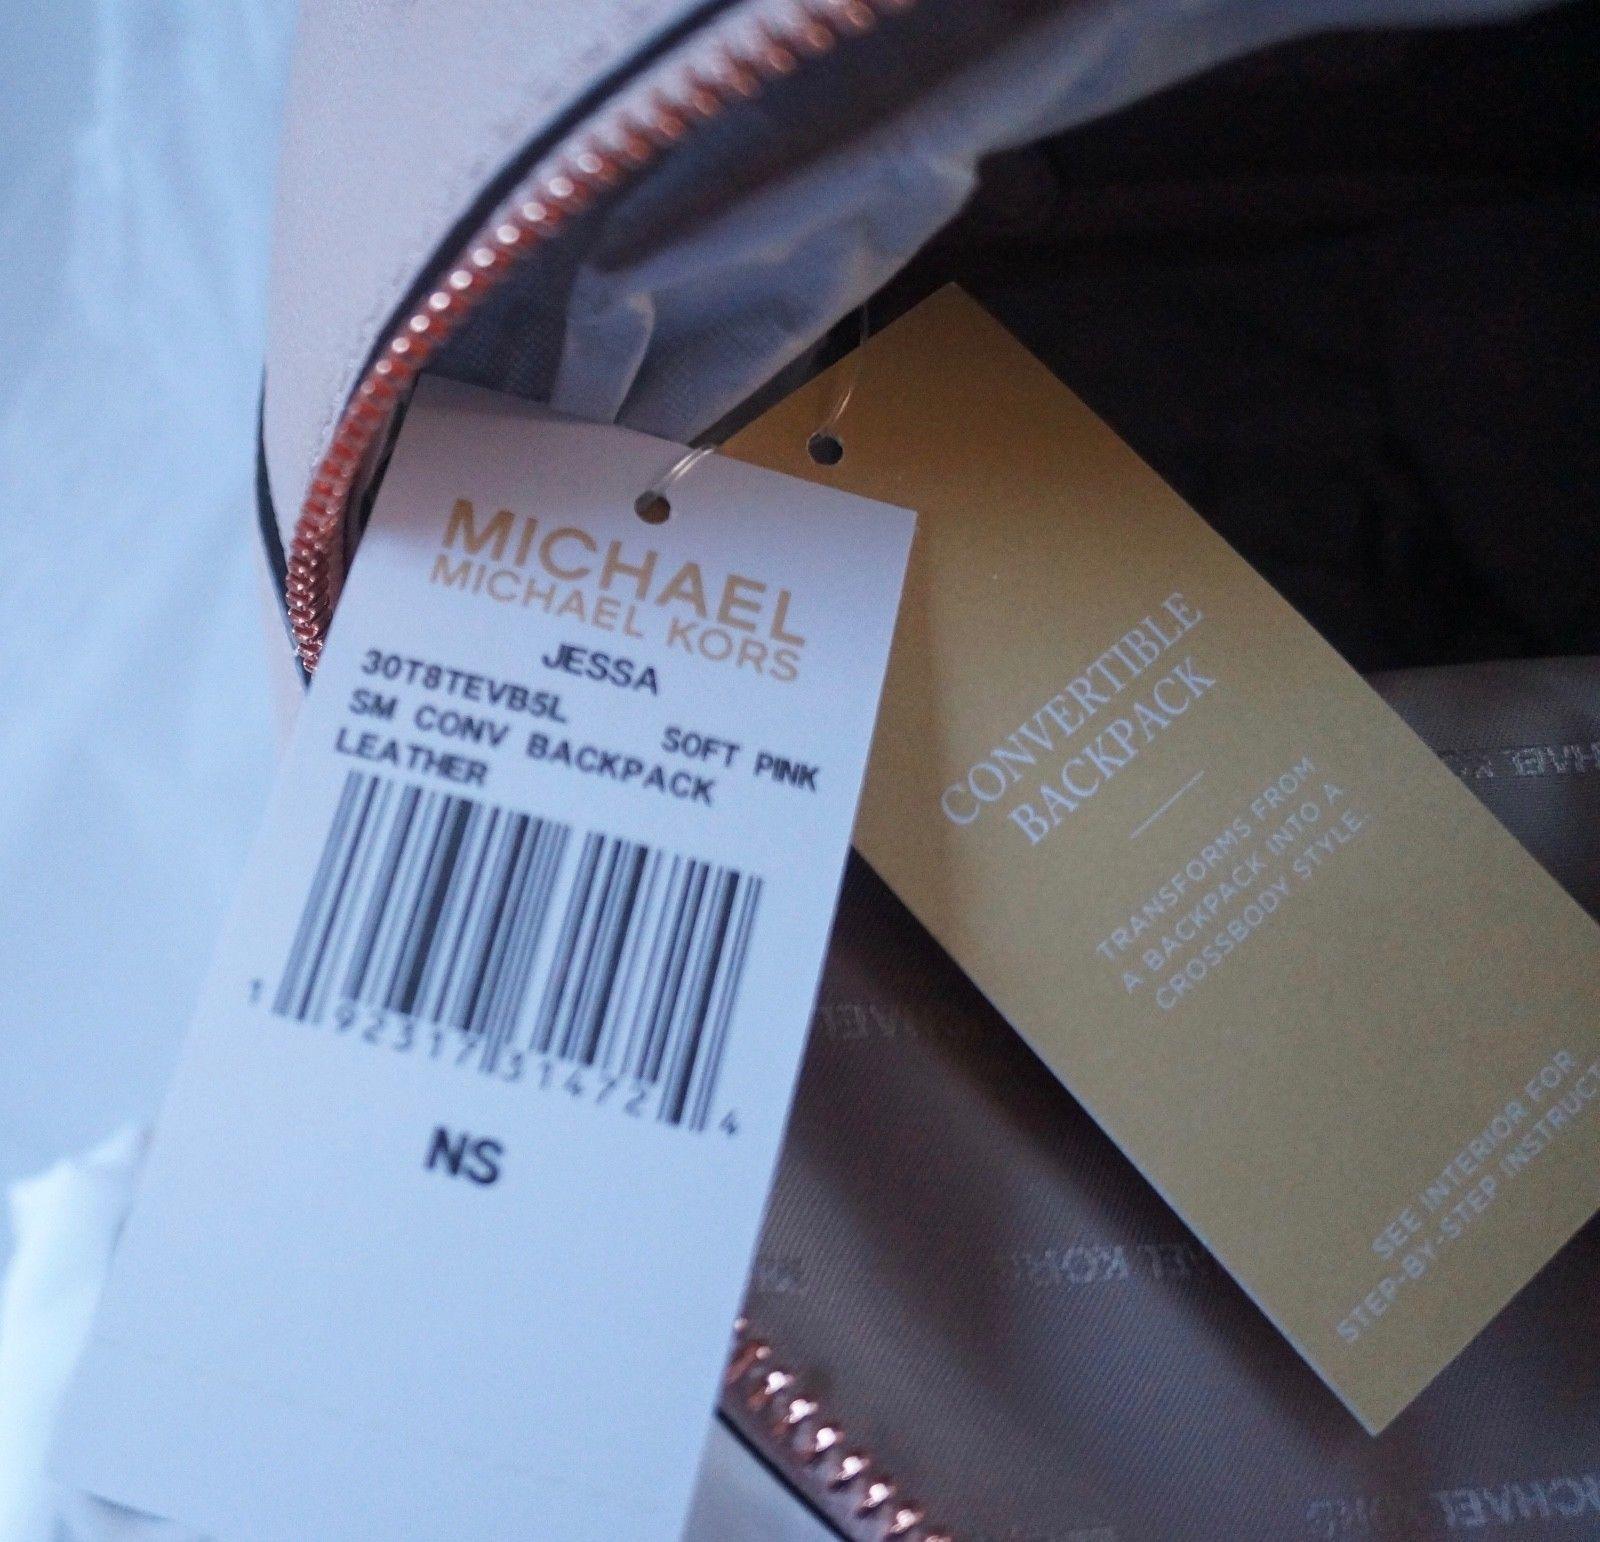 NWT MIchael Michael Kors Jessa Small Convertible Backpack   Soft Pink d313110c85781